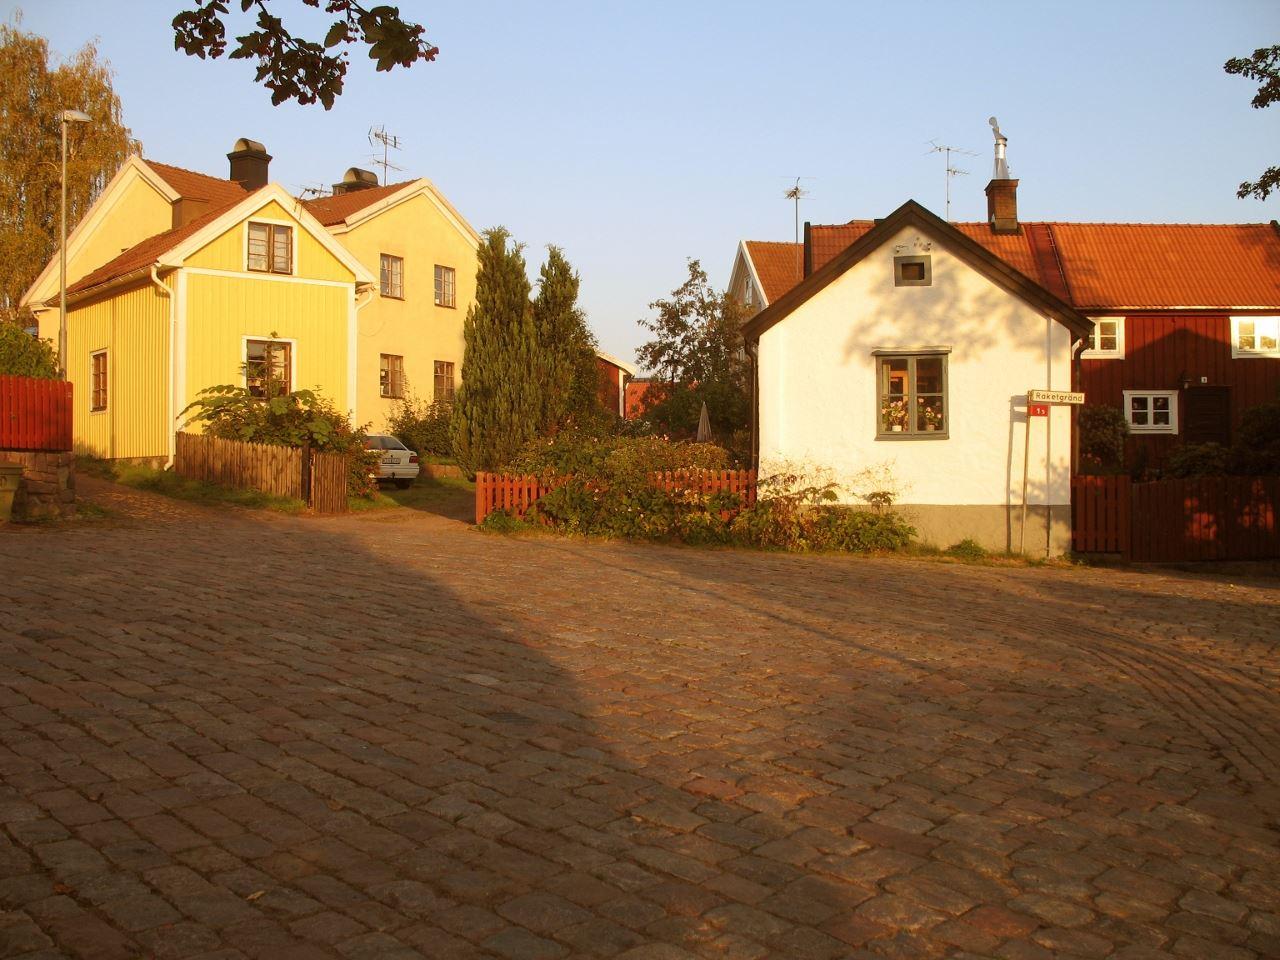 Fnyket and Besväret